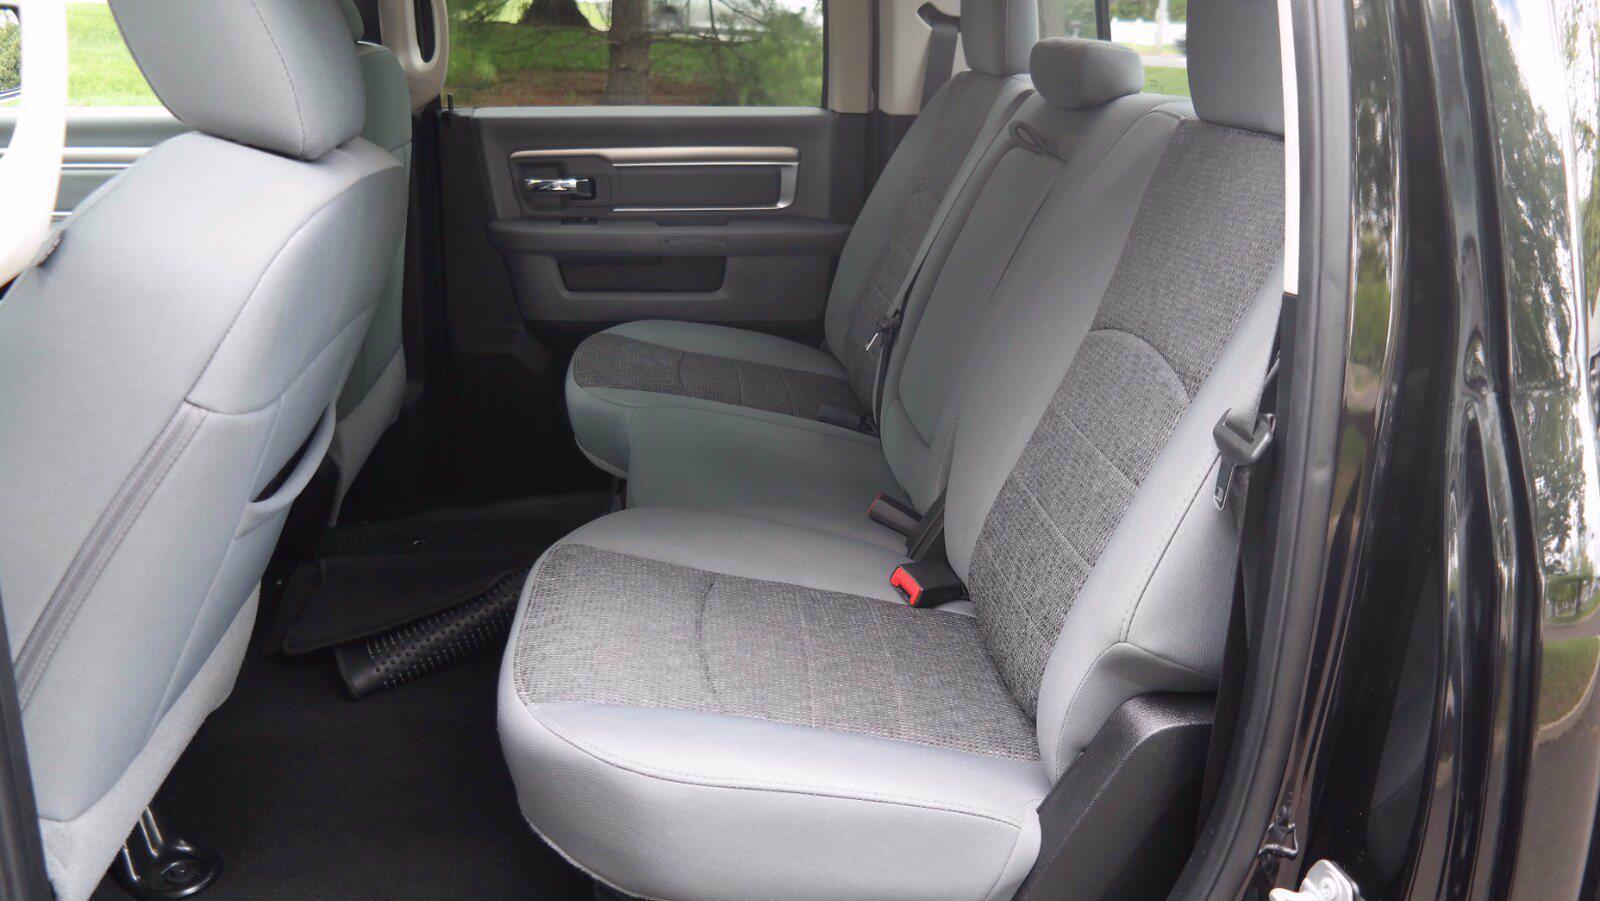 2018 Ram 1500 Crew Cab 4x4, Pickup #FL103691 - photo 23